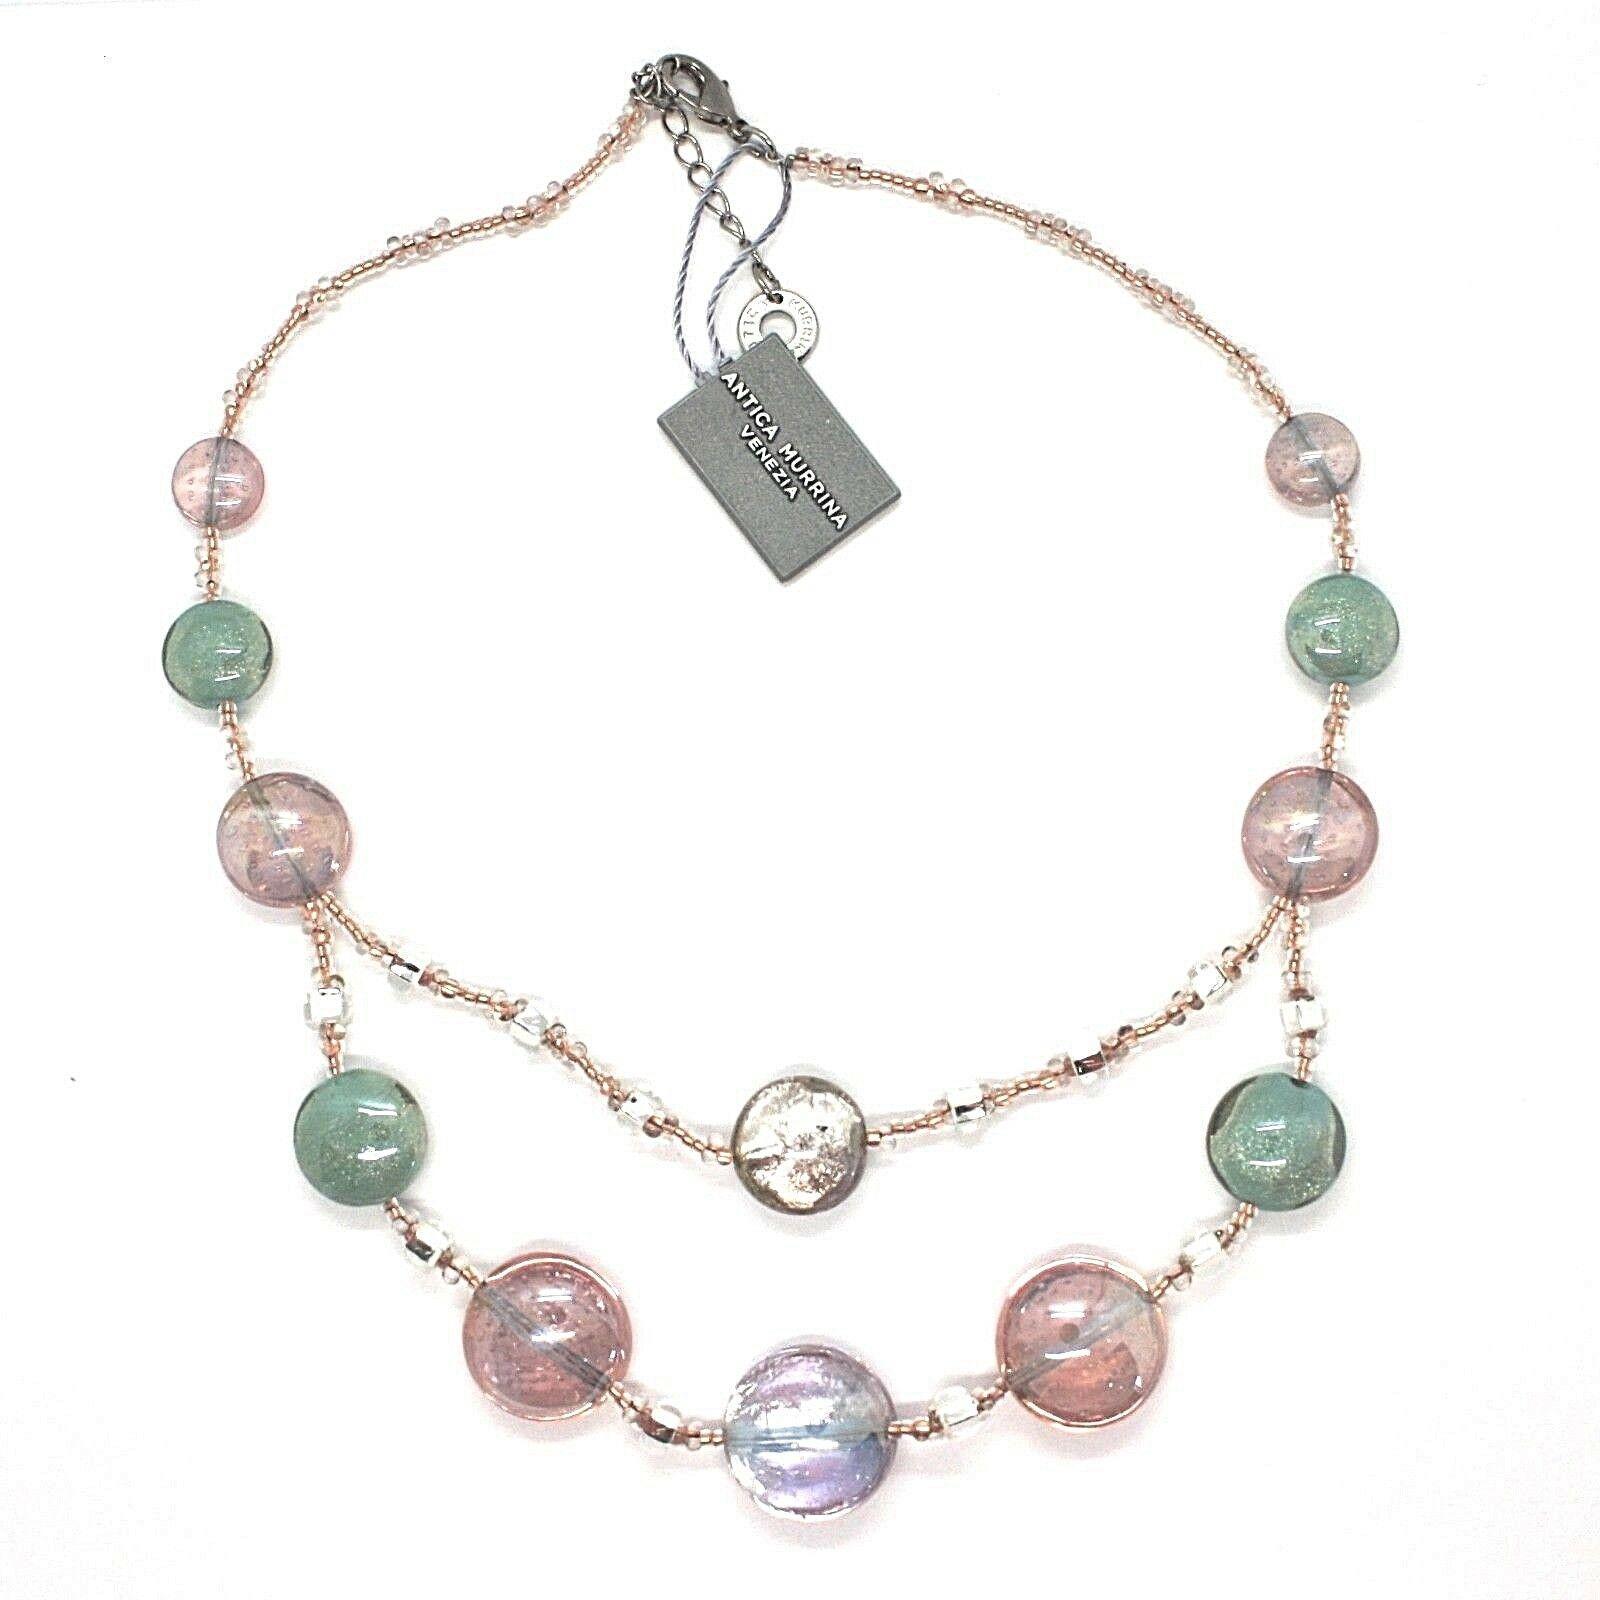 Necklace Antica Murrina Venezia Lampwork Murano Glass Charm Bead Purple Green